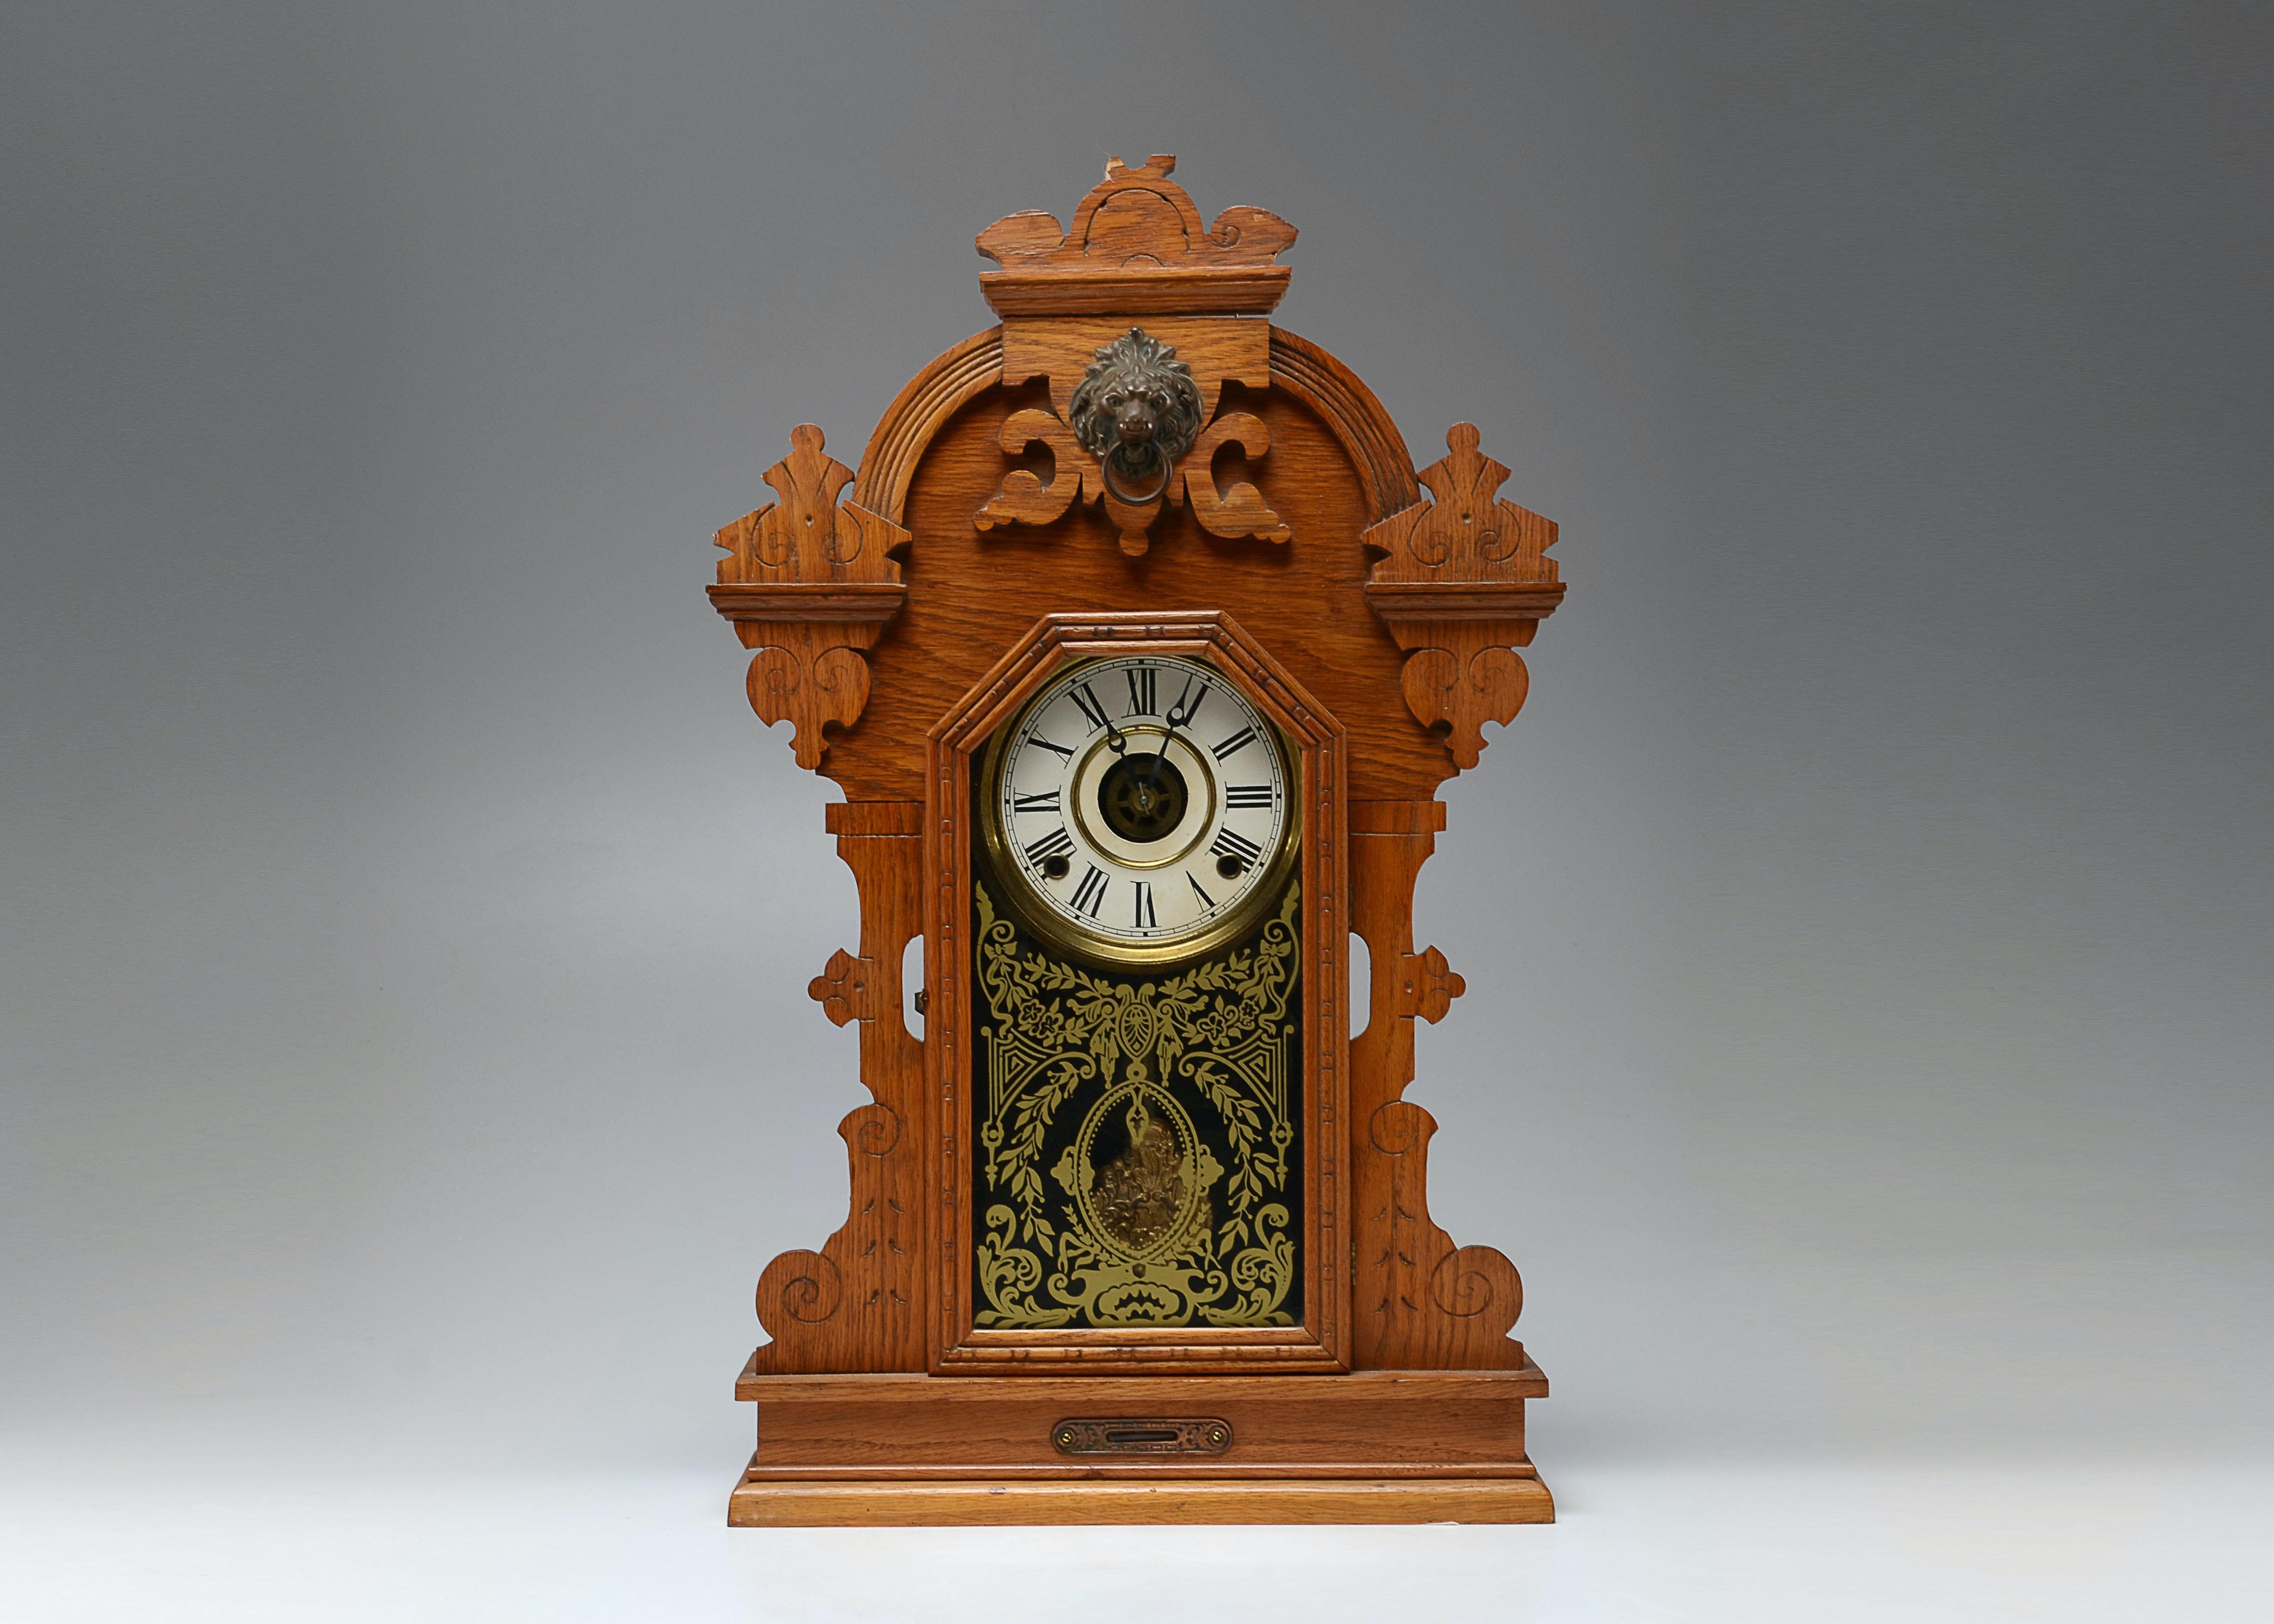 Antique victorian mantel clocks for sale